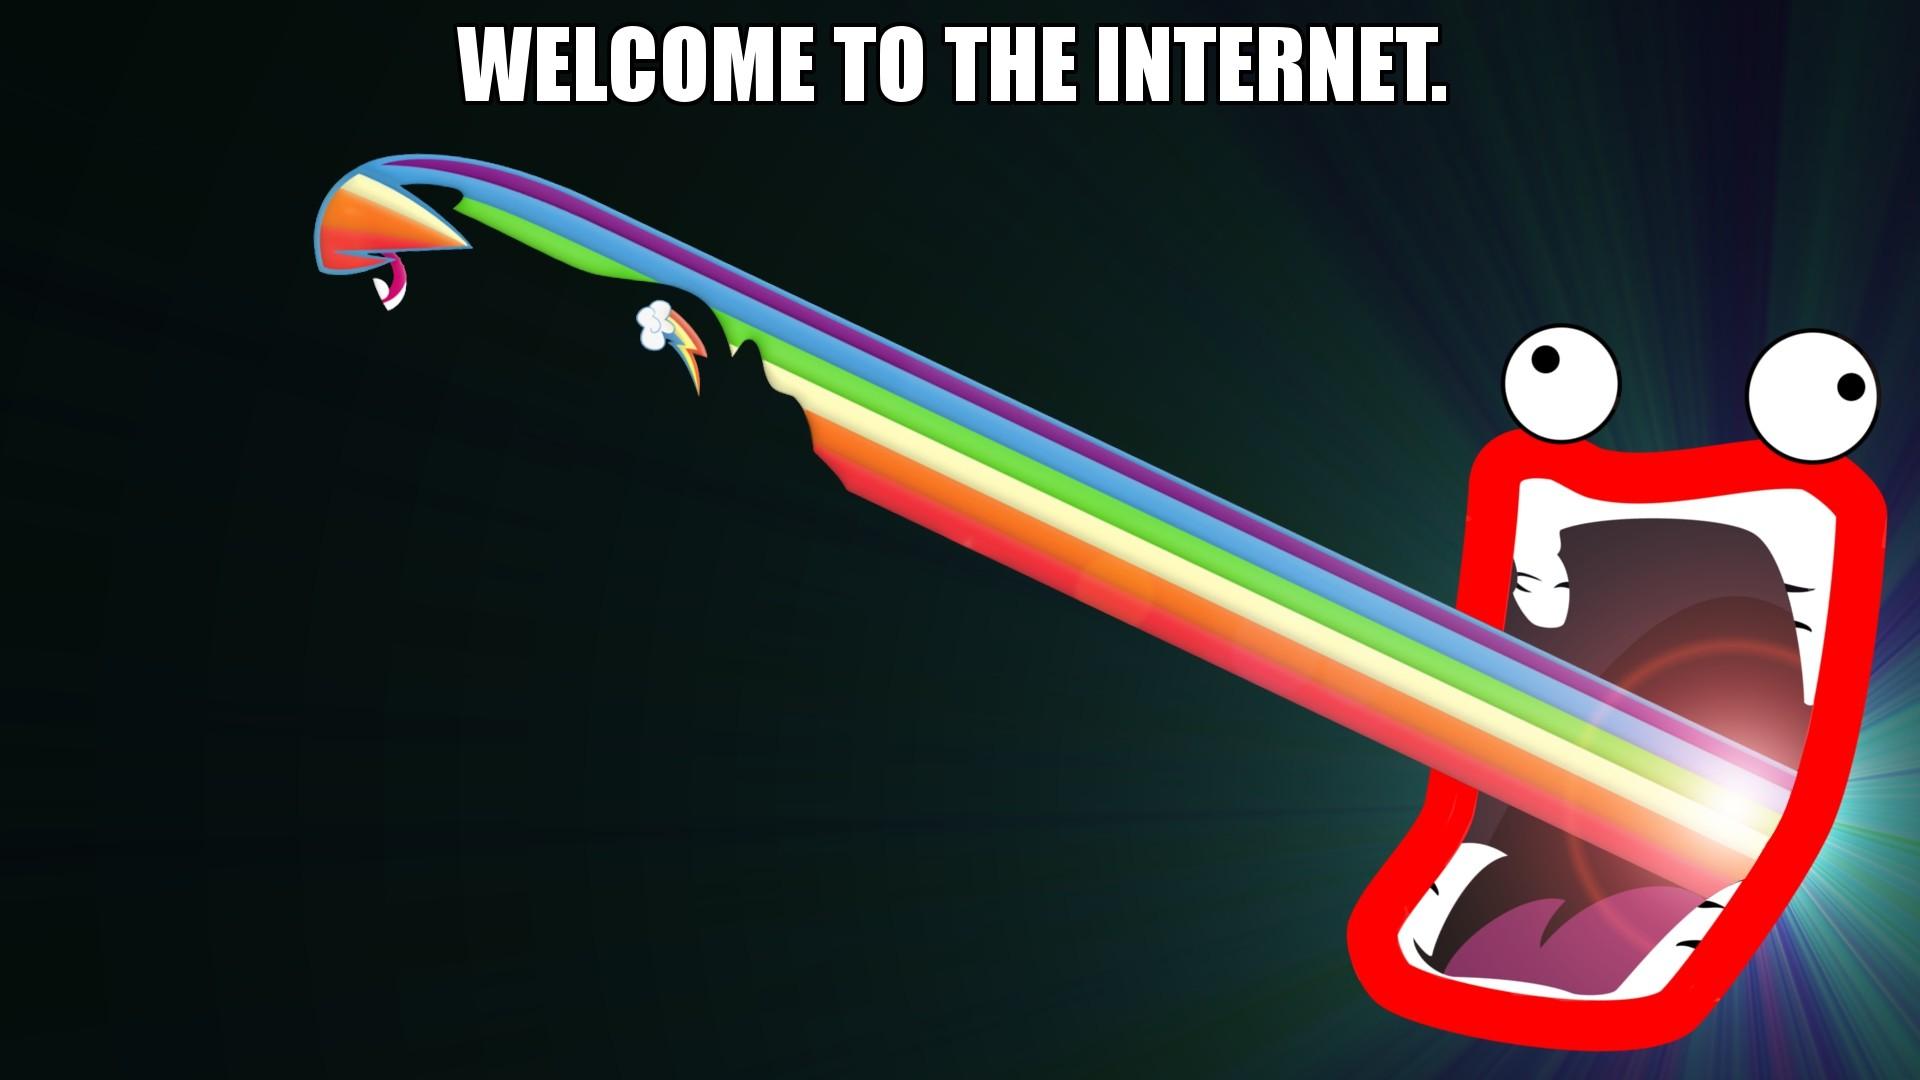 Internet Meme Wallpaper 4582